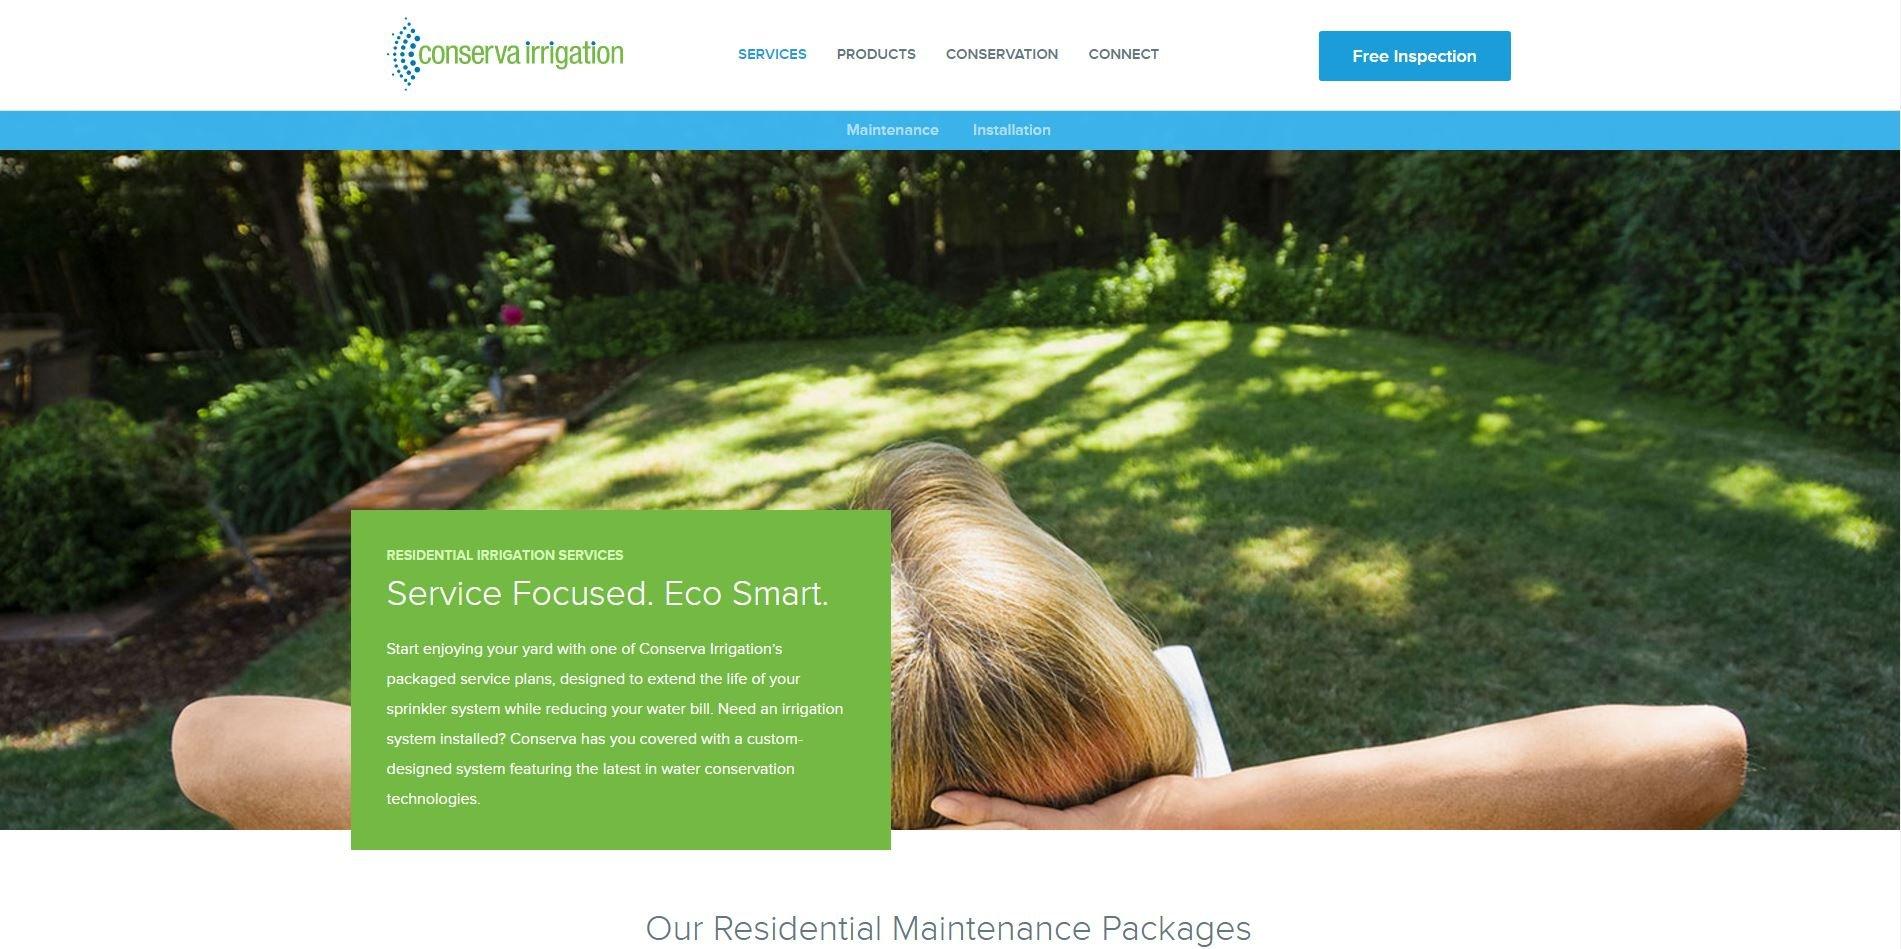 Conserva-irrigation-website-picture-person.jpg